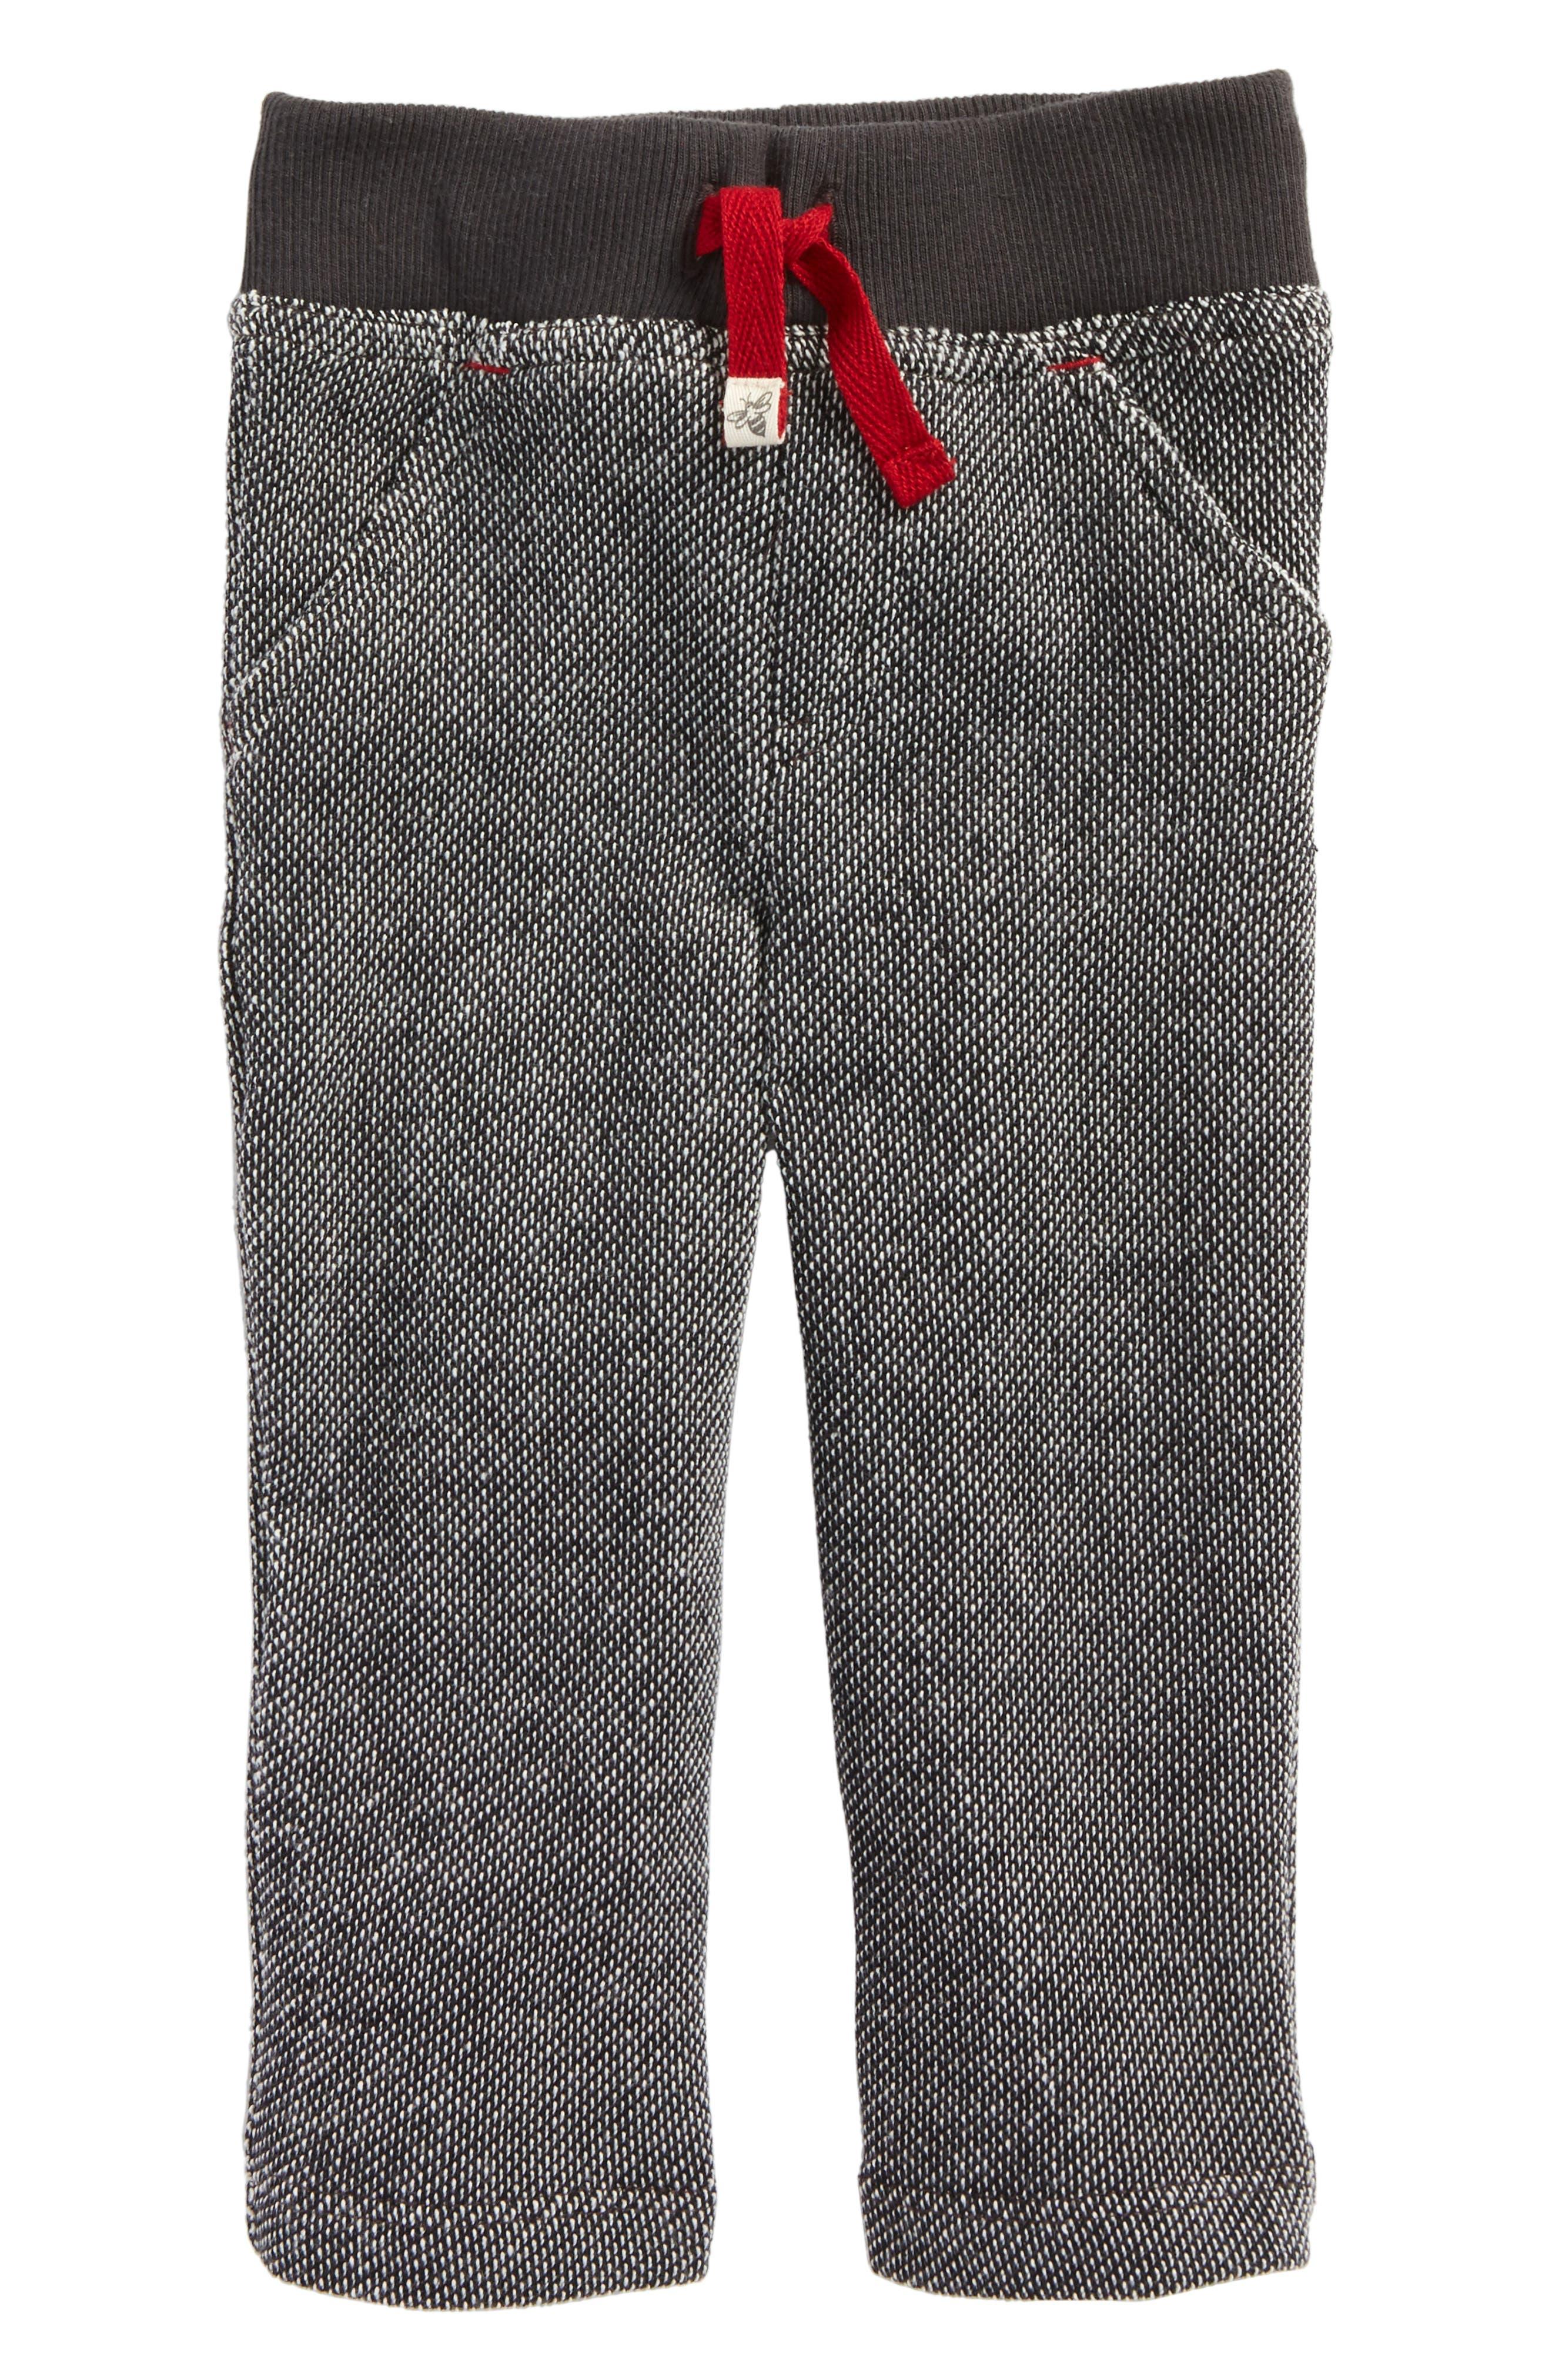 Alternate Image 1 Selected - Burt's Bees Baby Piqué Organic Cotton Pants (Baby Boys)